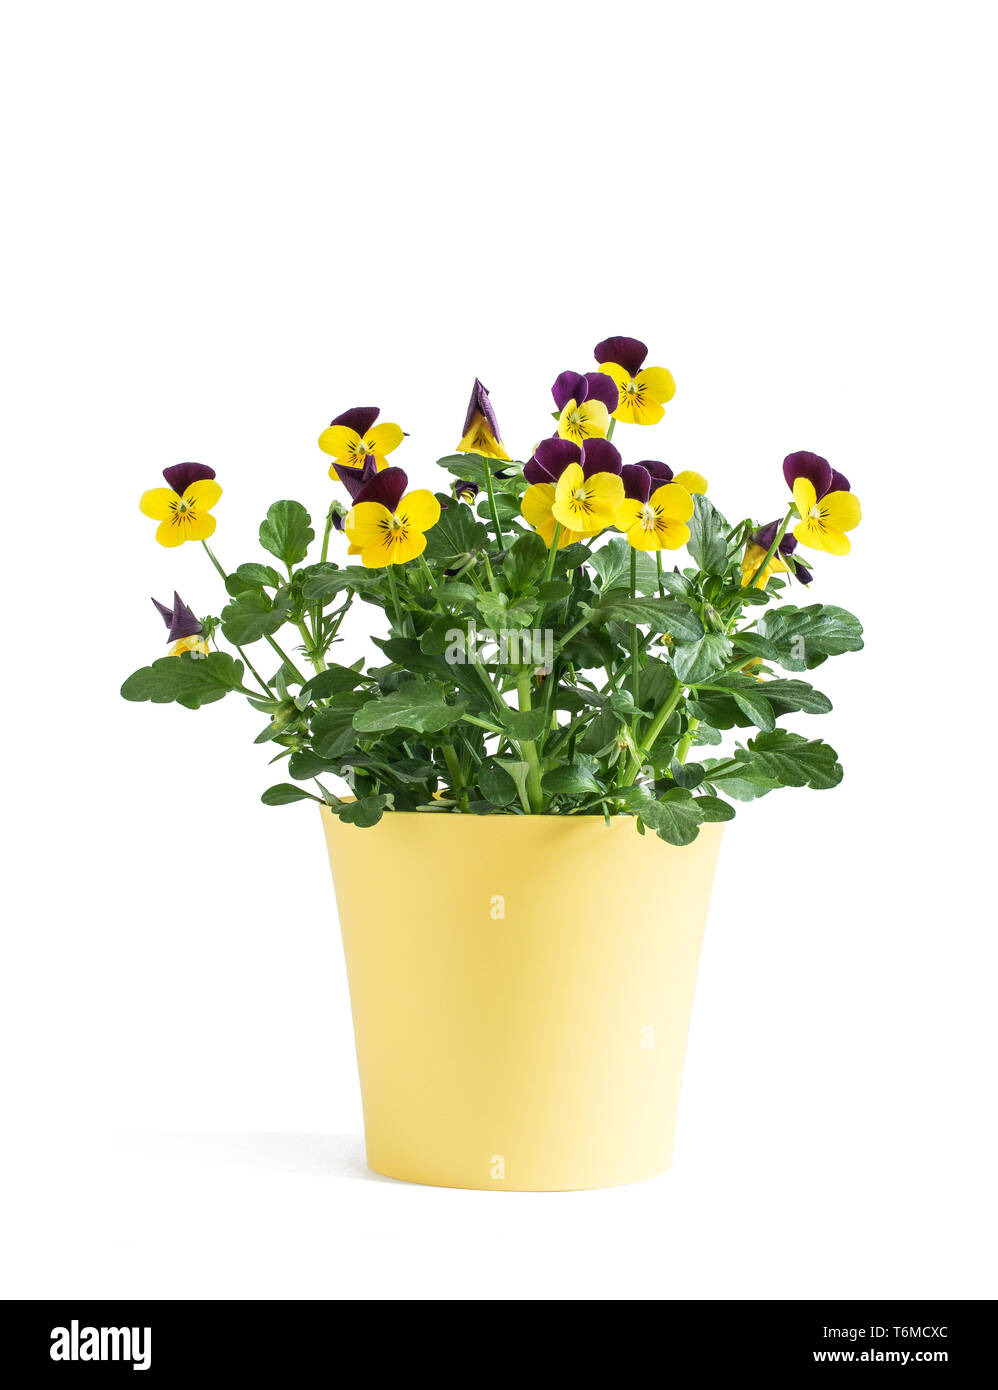 Heartsease flower in yellow vase isolated on white background Stock Photo